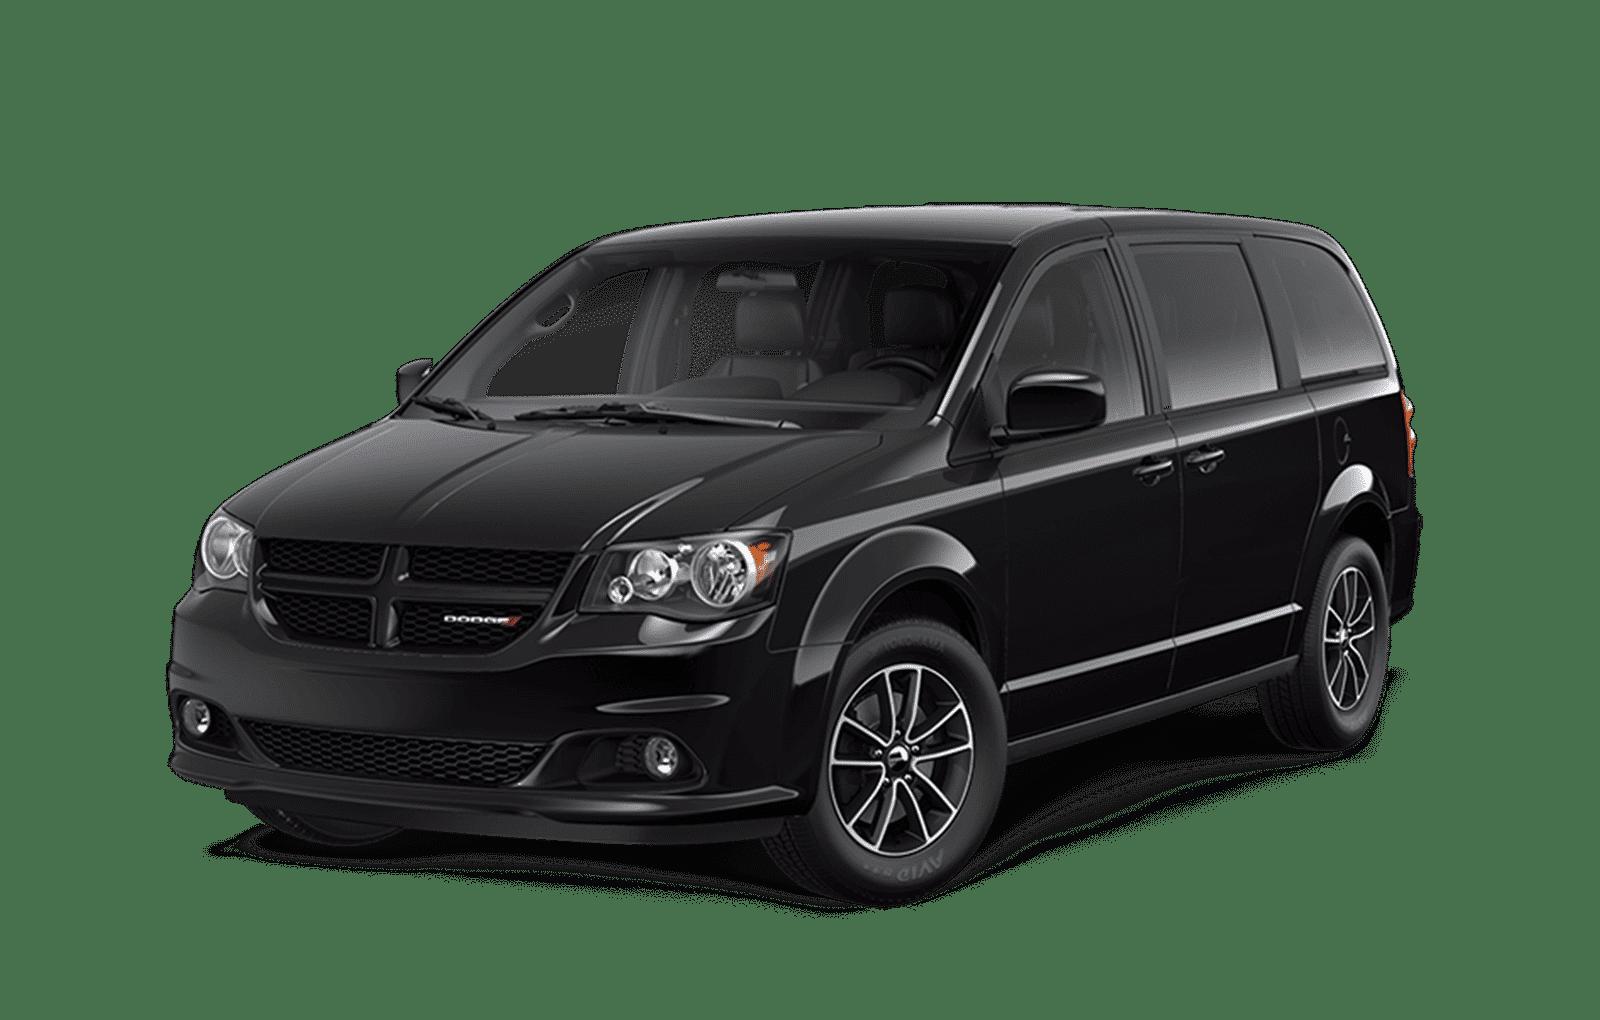 2019 Dodge Grand Caravan Dealer Pricing Report